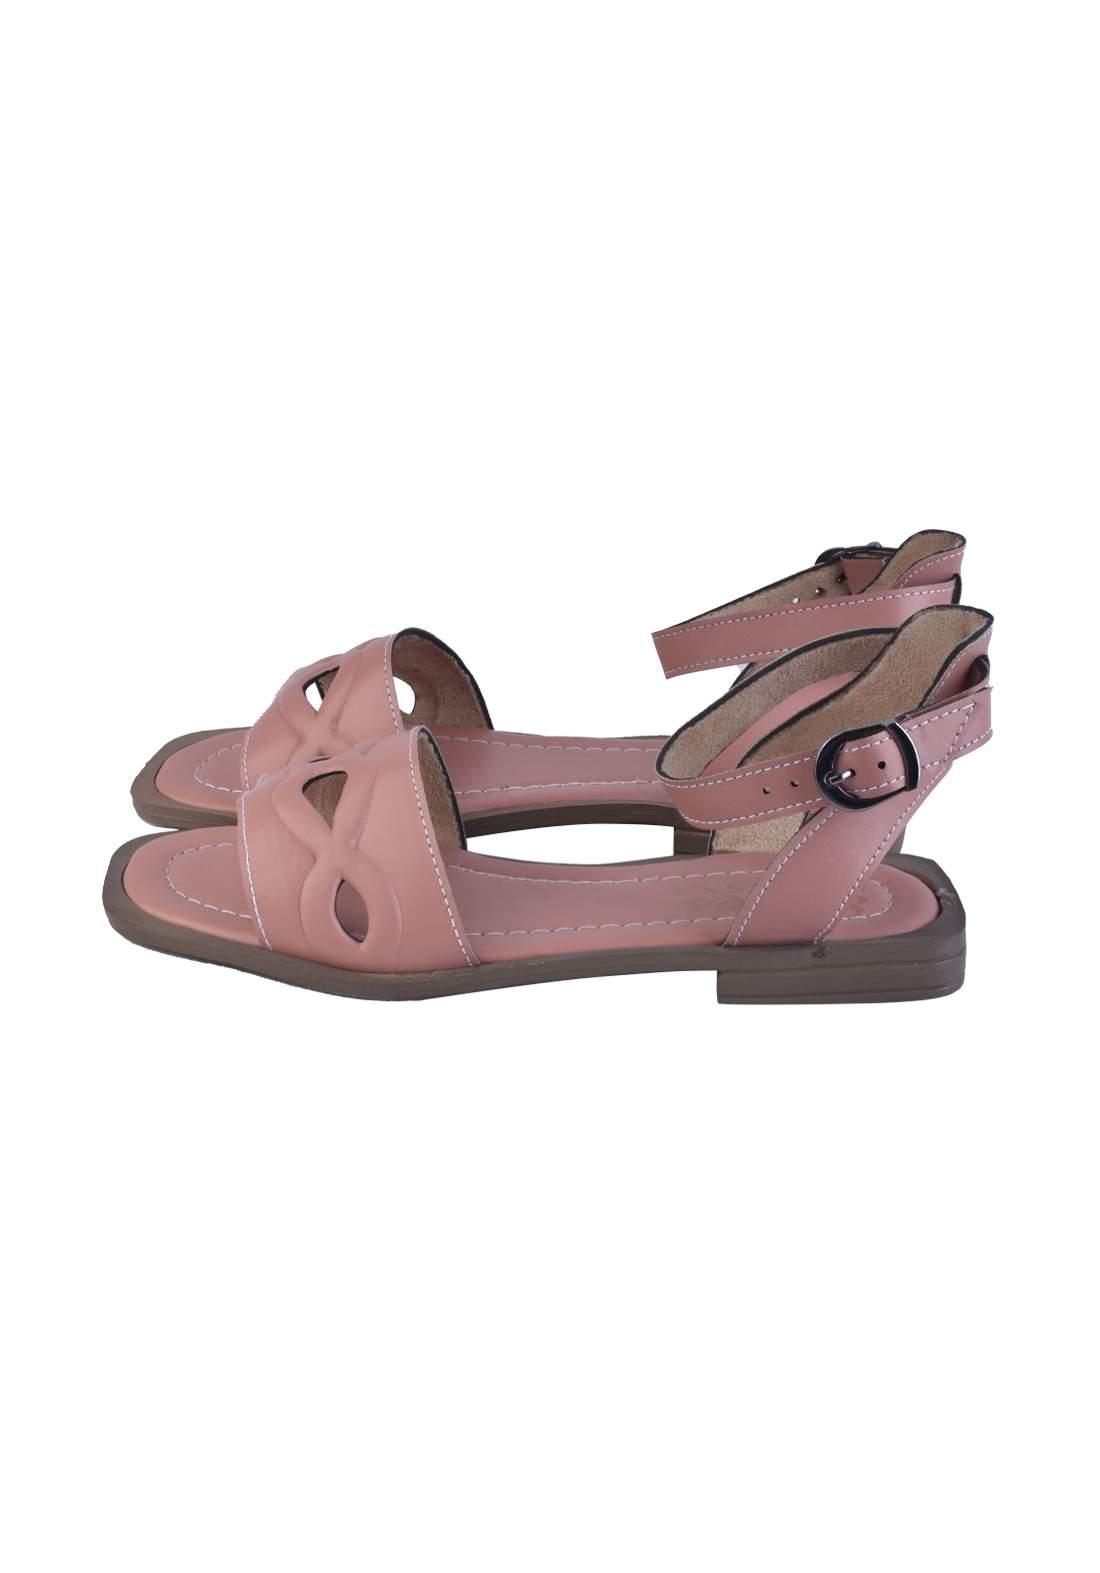 حذاء نسائي وردي اللون